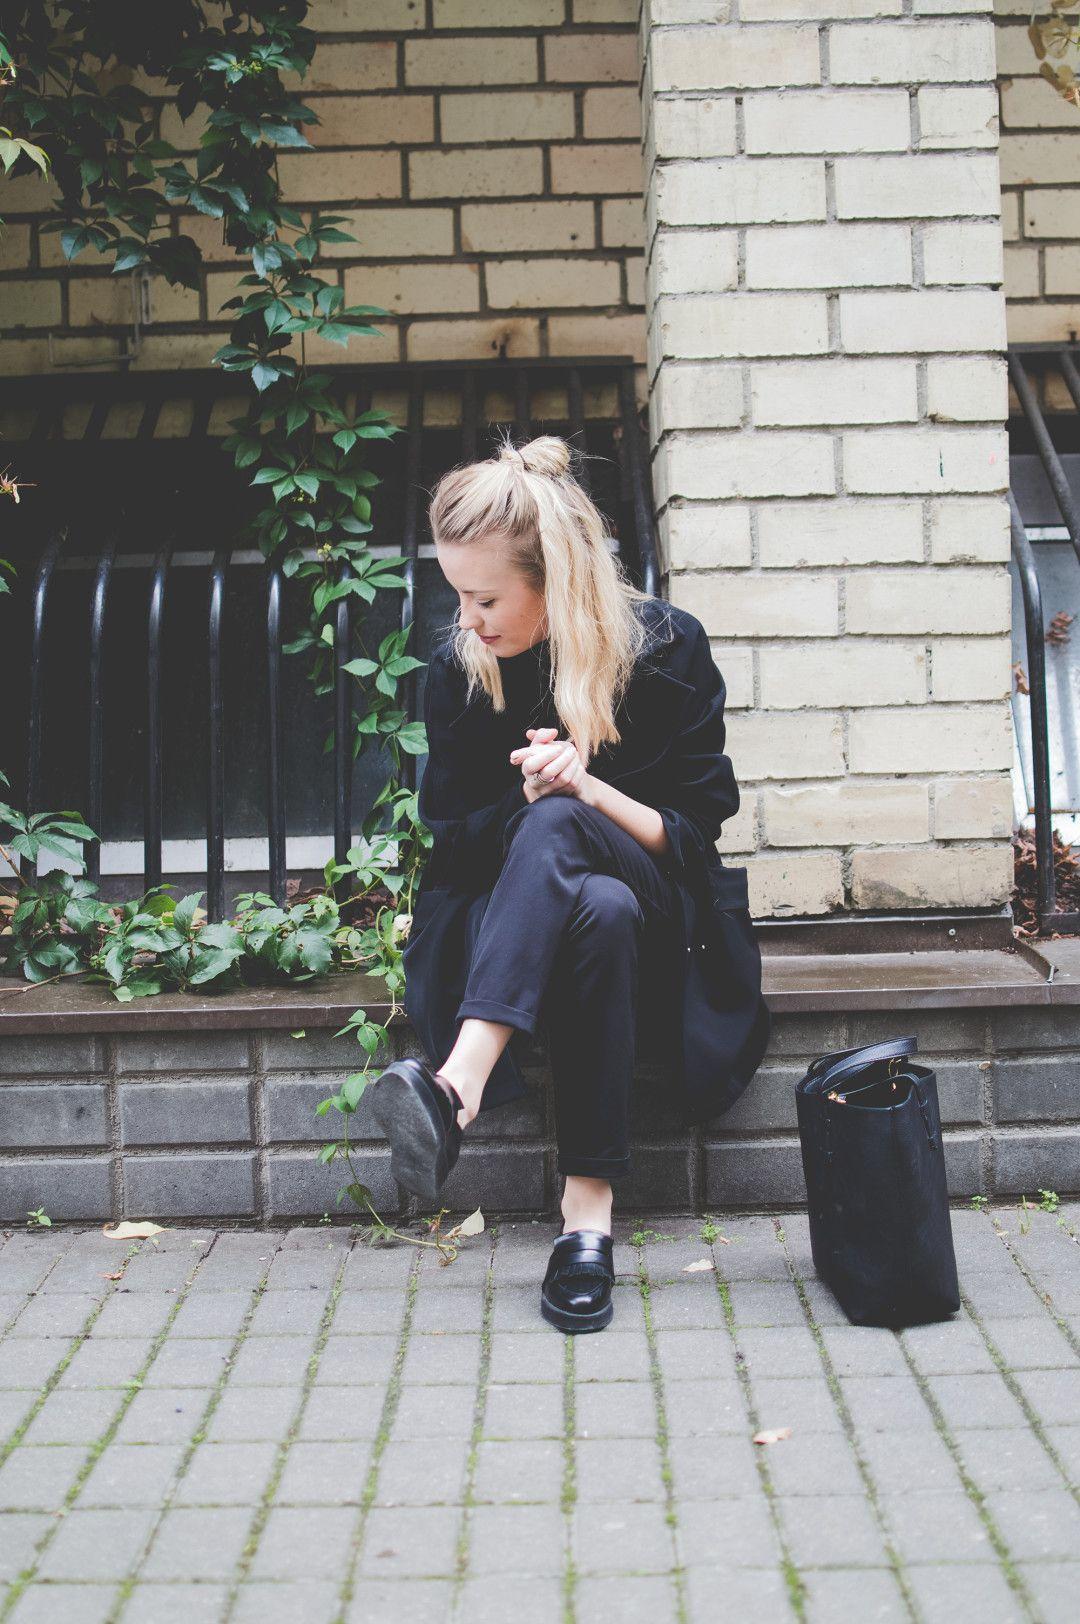 I Ll Stop Wearing Black When They Make A Darker Color Lifestyle Blog Entrepreneur Blogging Tips Kotry Fashion Blog Inspiration Style Scandinavian Fashion